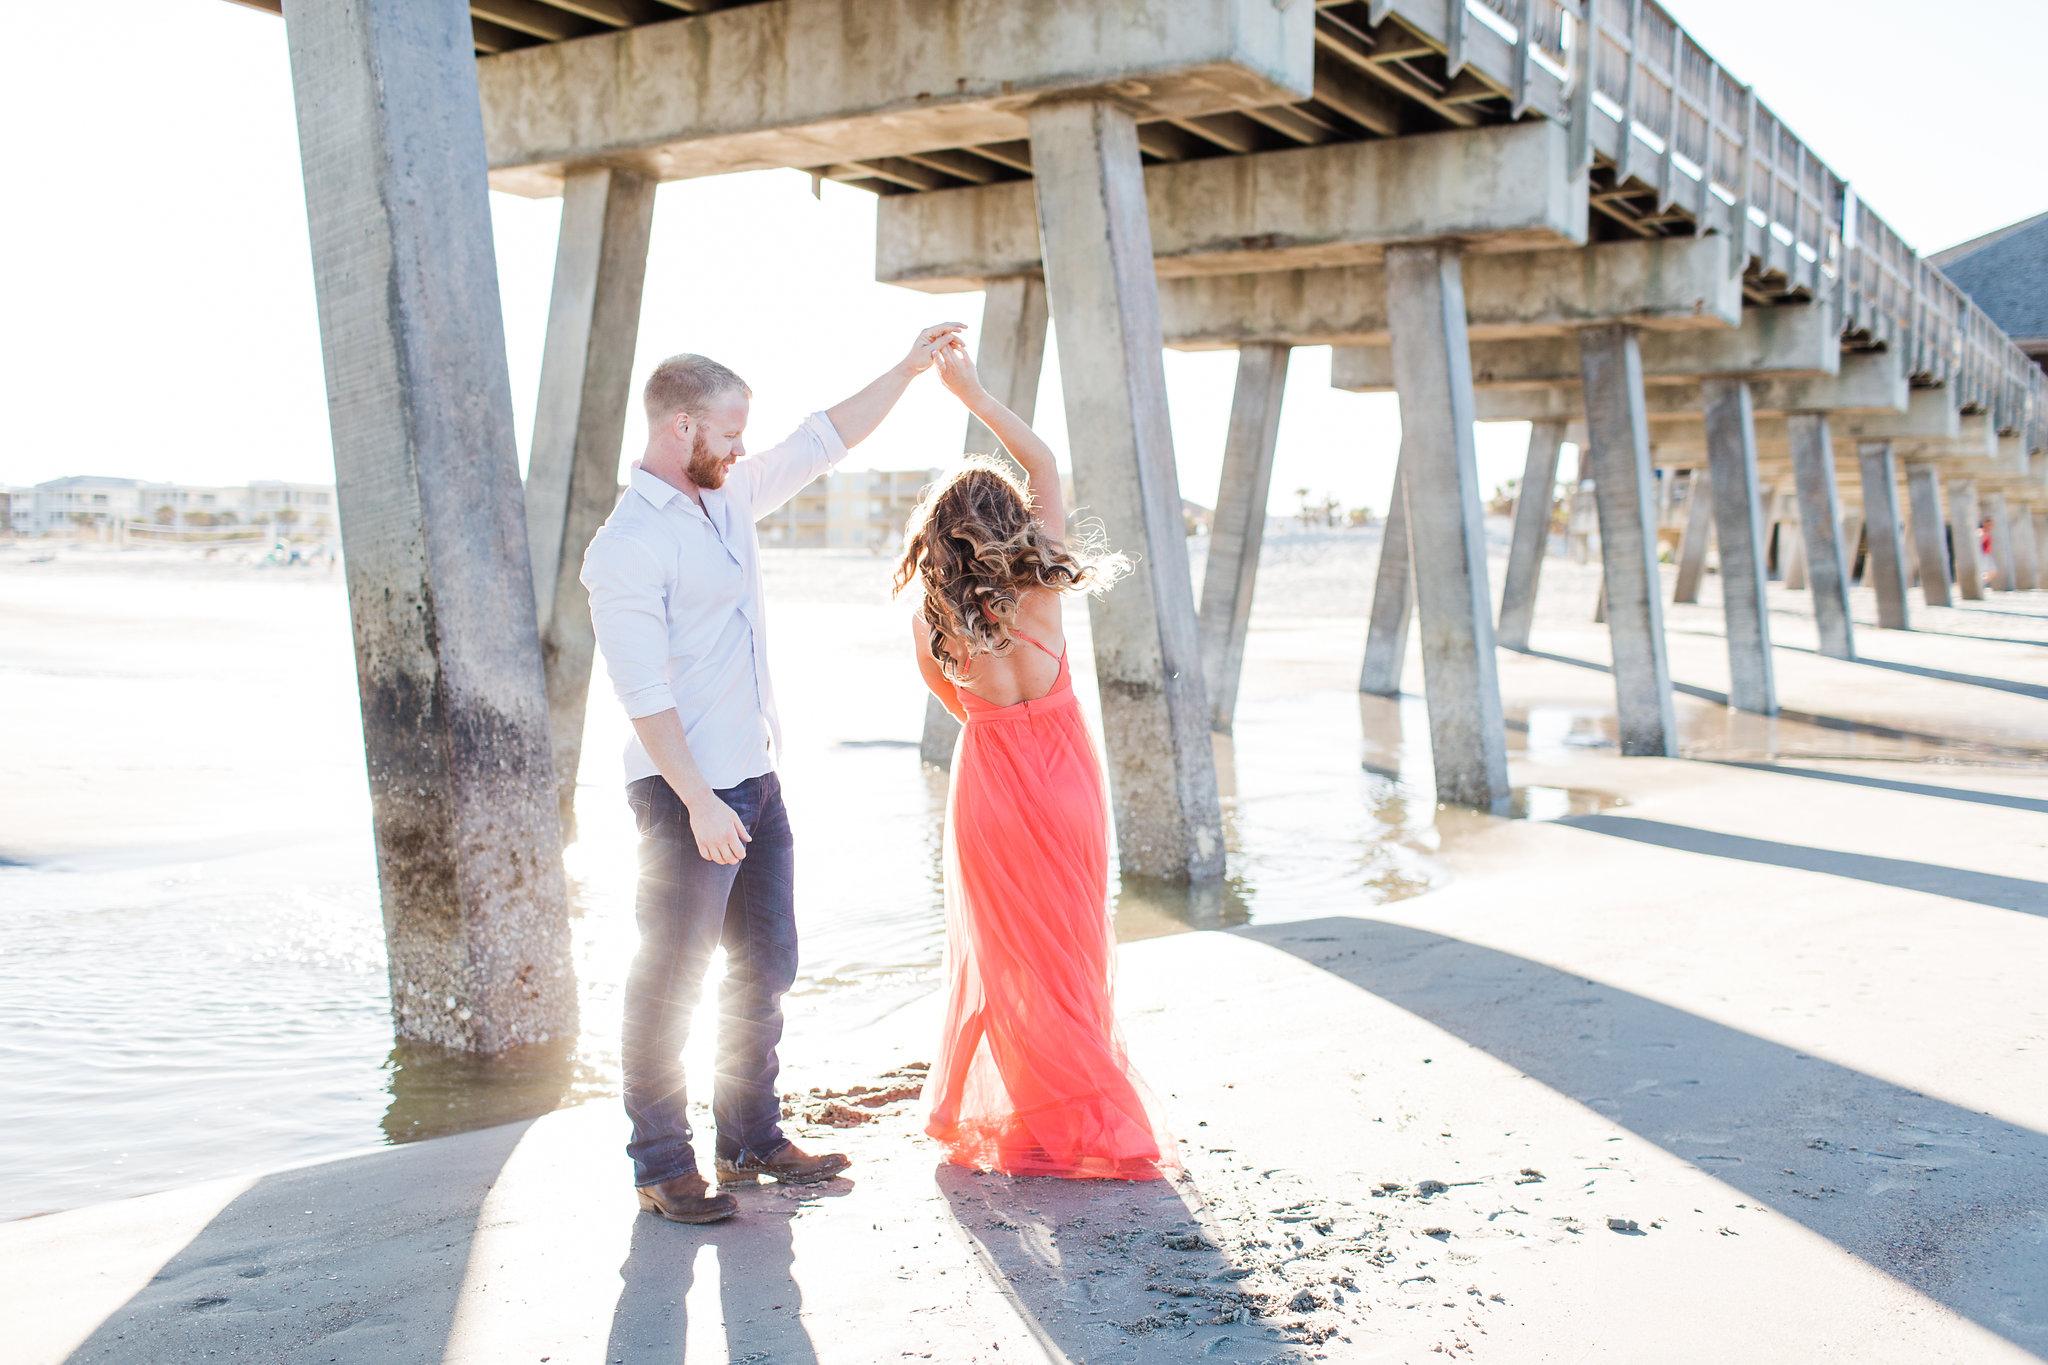 Erin-kevin-apt-b-photography-tybee-island-engagement-photoshoot-savannah-engagement-savannah-wedding-savannah-wedding-photographer-tybee-island-wedding-beach-engagement-7.jpg